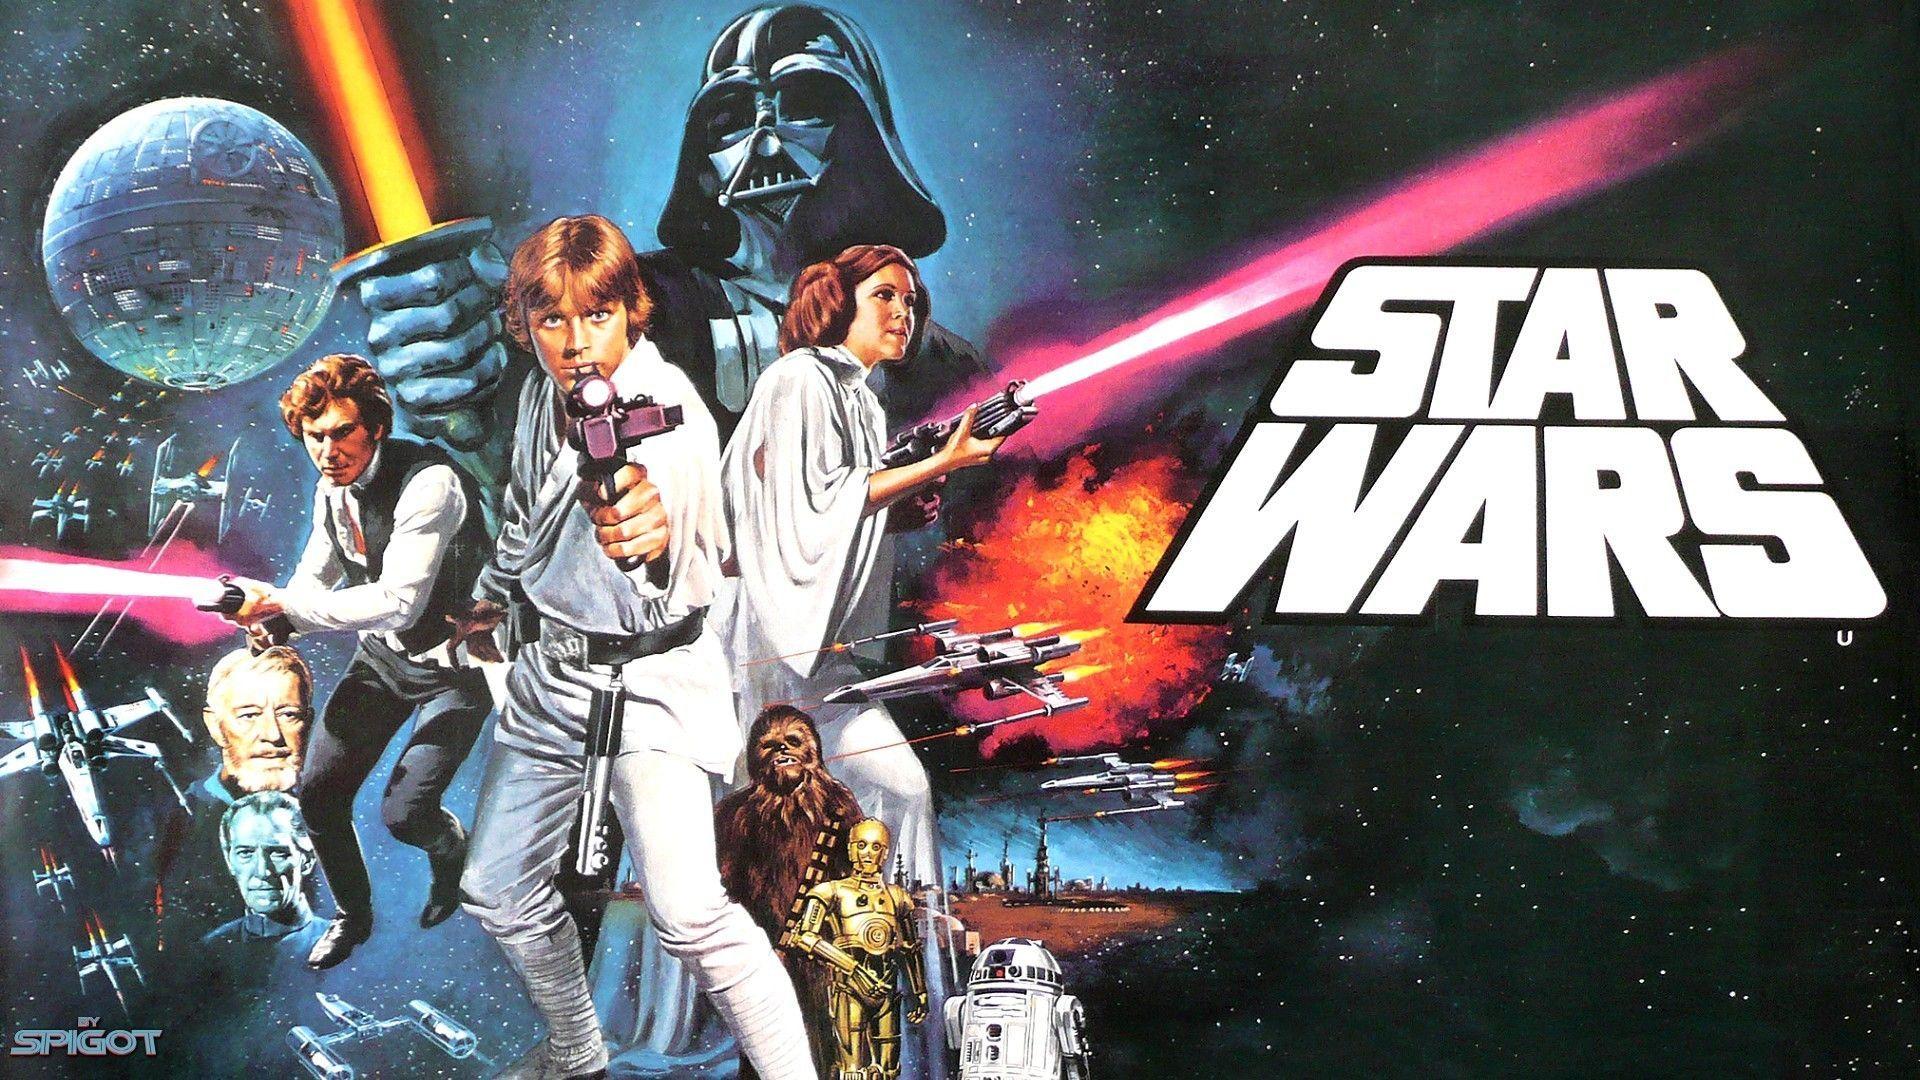 Hd Widescreen Cover Star Wars Cecilie Feldbaum